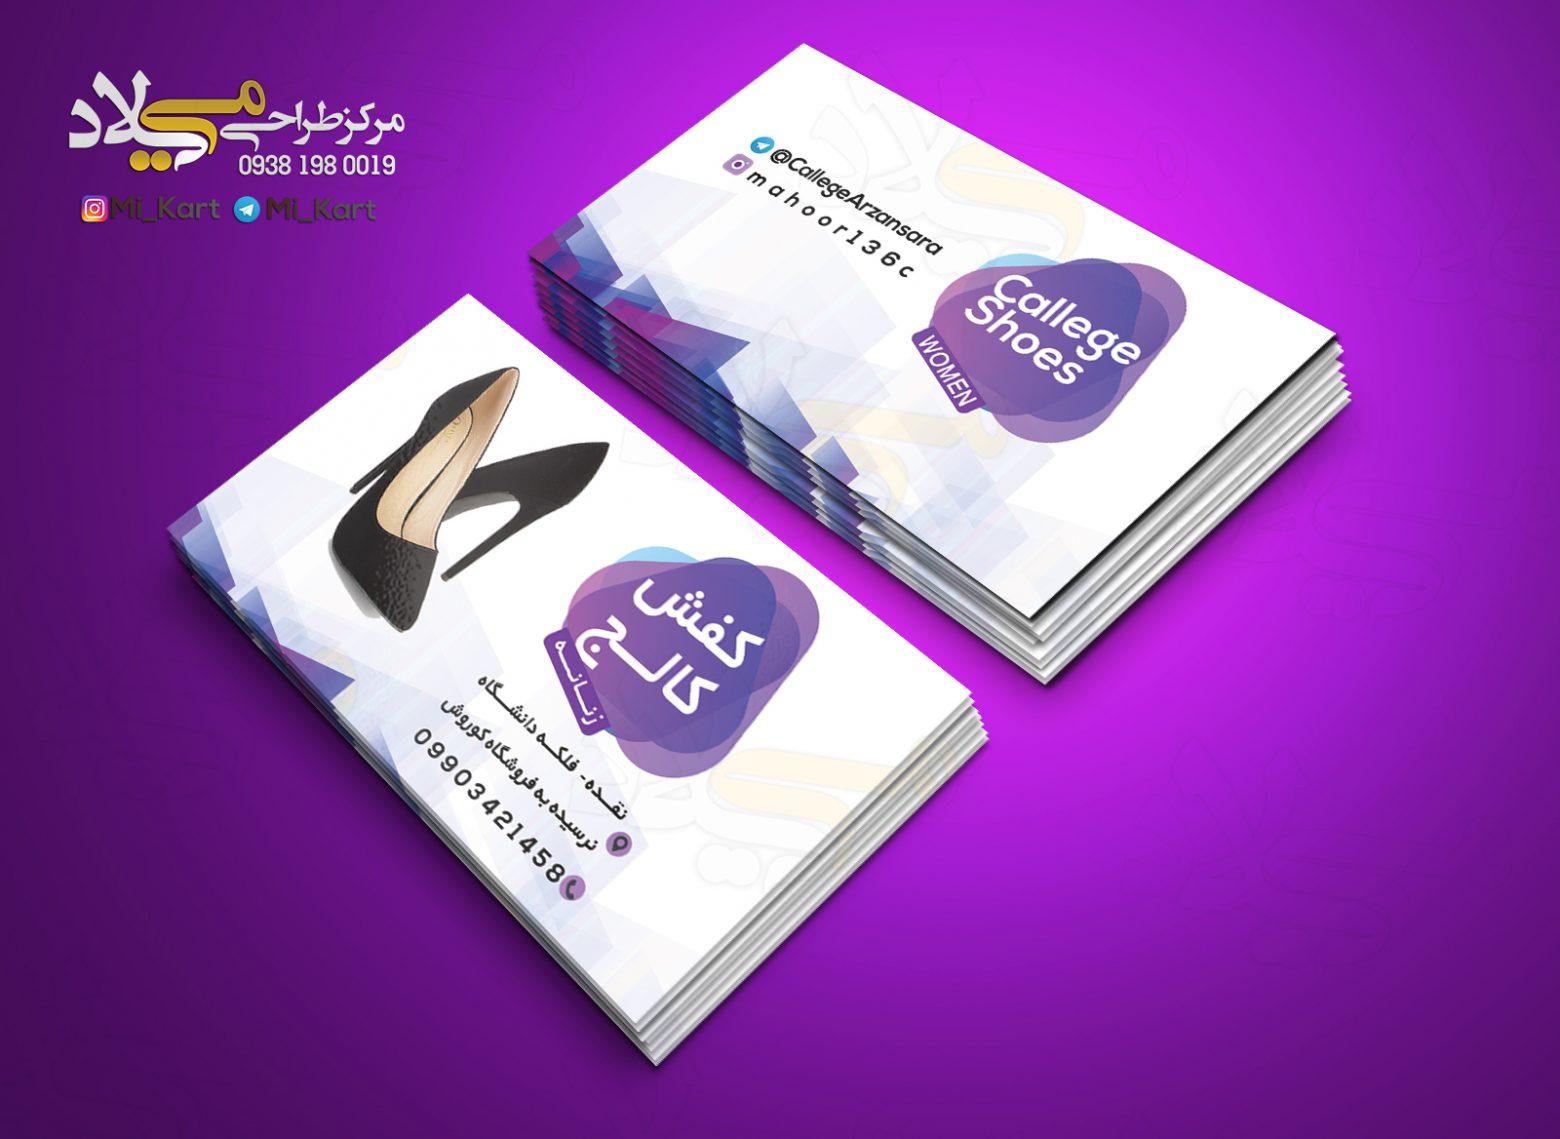 @Mi Kart Caleg 1560x1139 - کارت ویزیت فروشگاه کفش